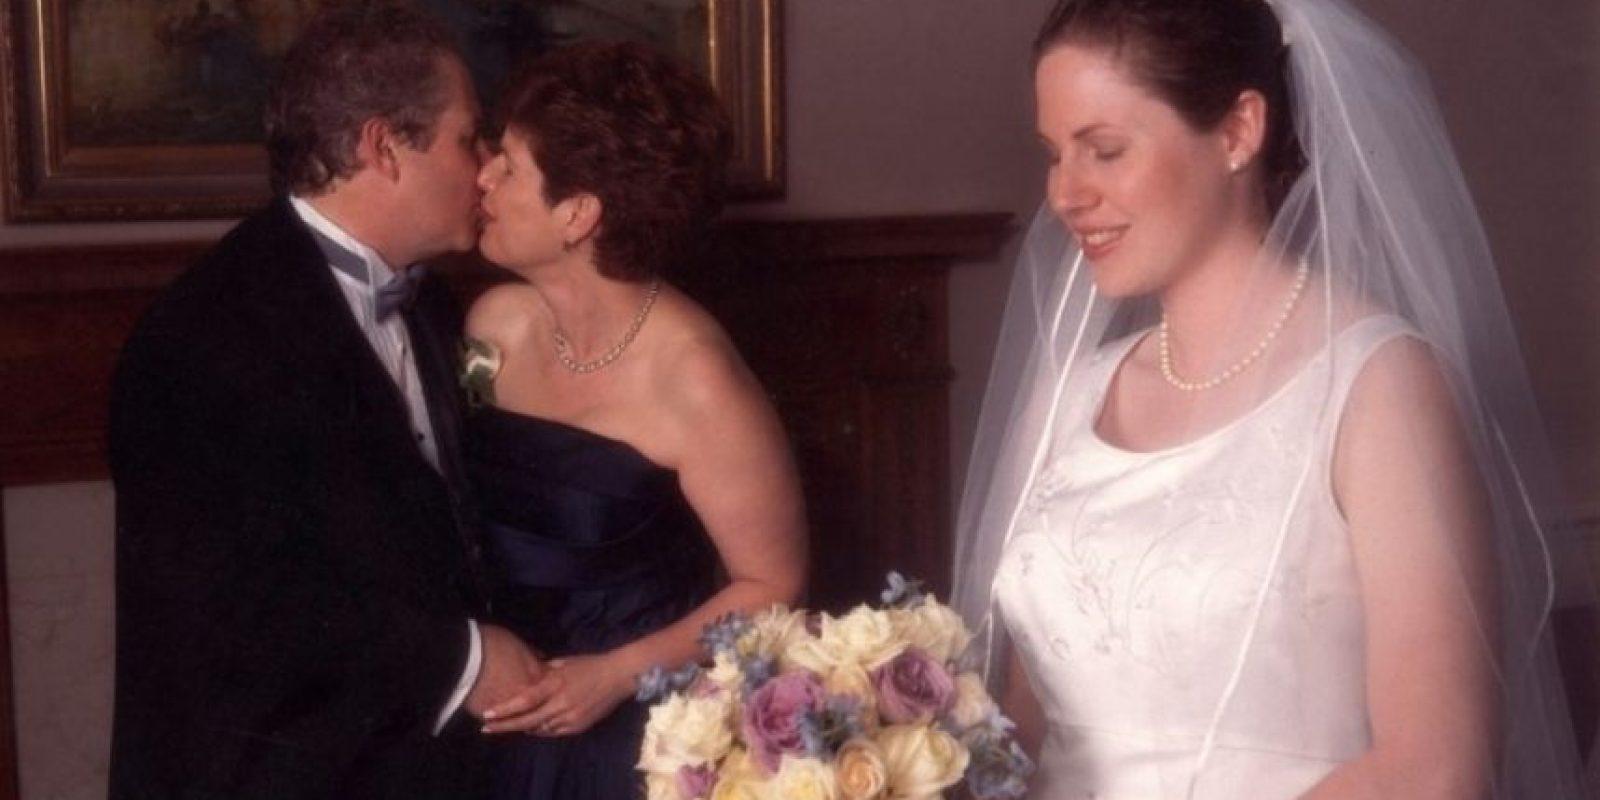 ¿En serio, cariño? ¿A tu madre primero? Foto:Awkward Family Photos